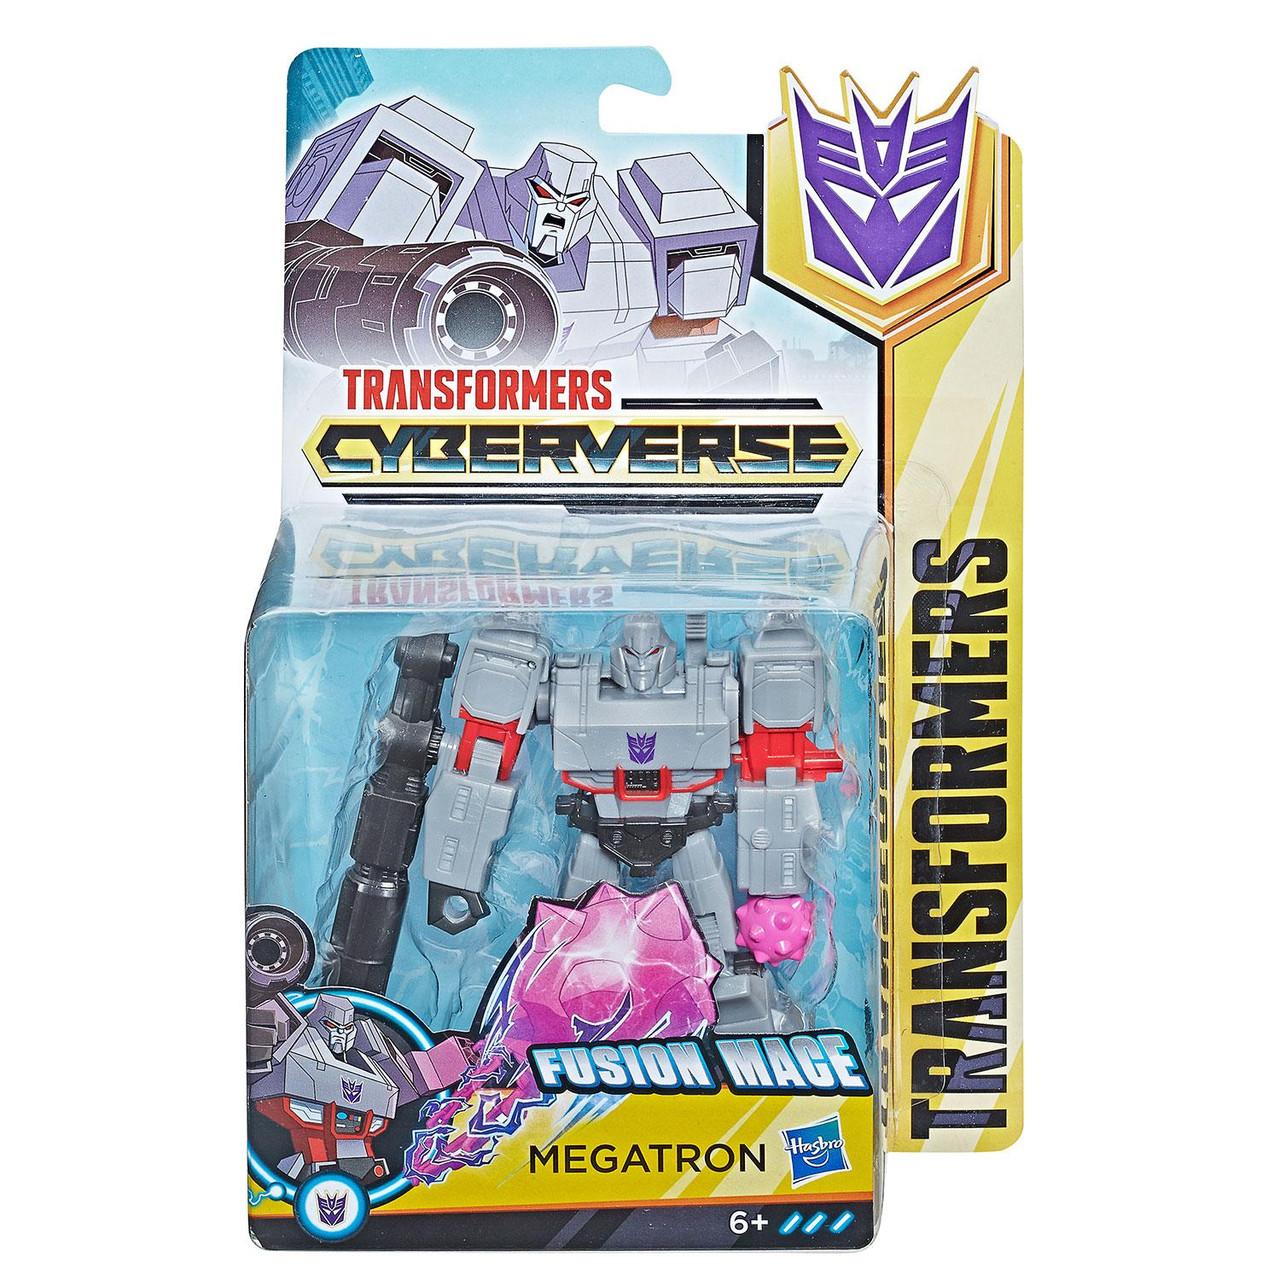 Transformers Cyberverse Action Attackers Warrior Class Autobot Drift